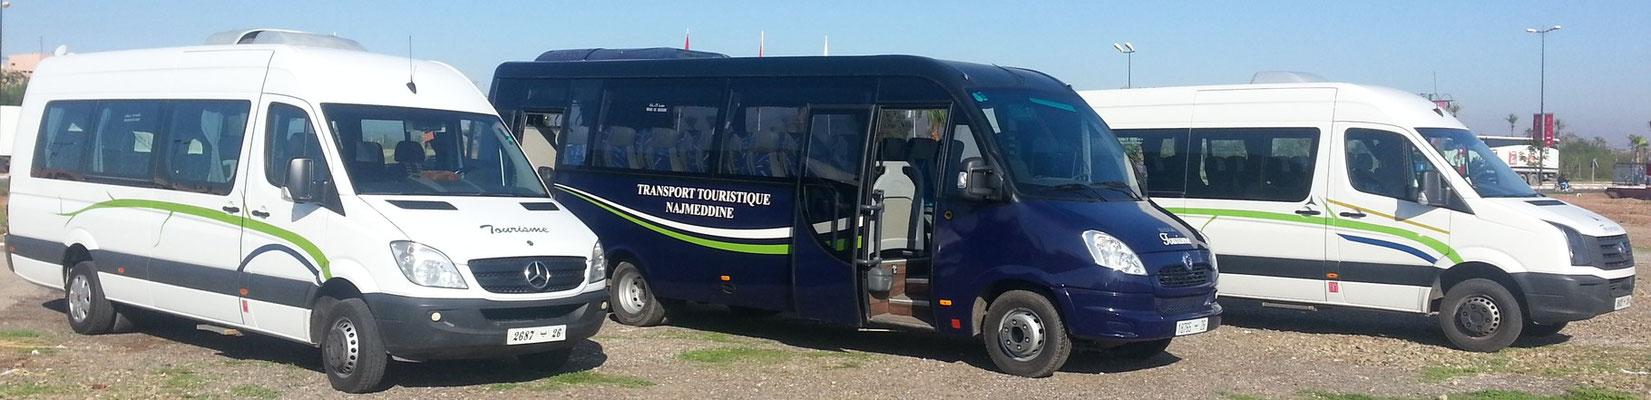 TRANSPORT TOURISTIQUE NAJMEDDINE